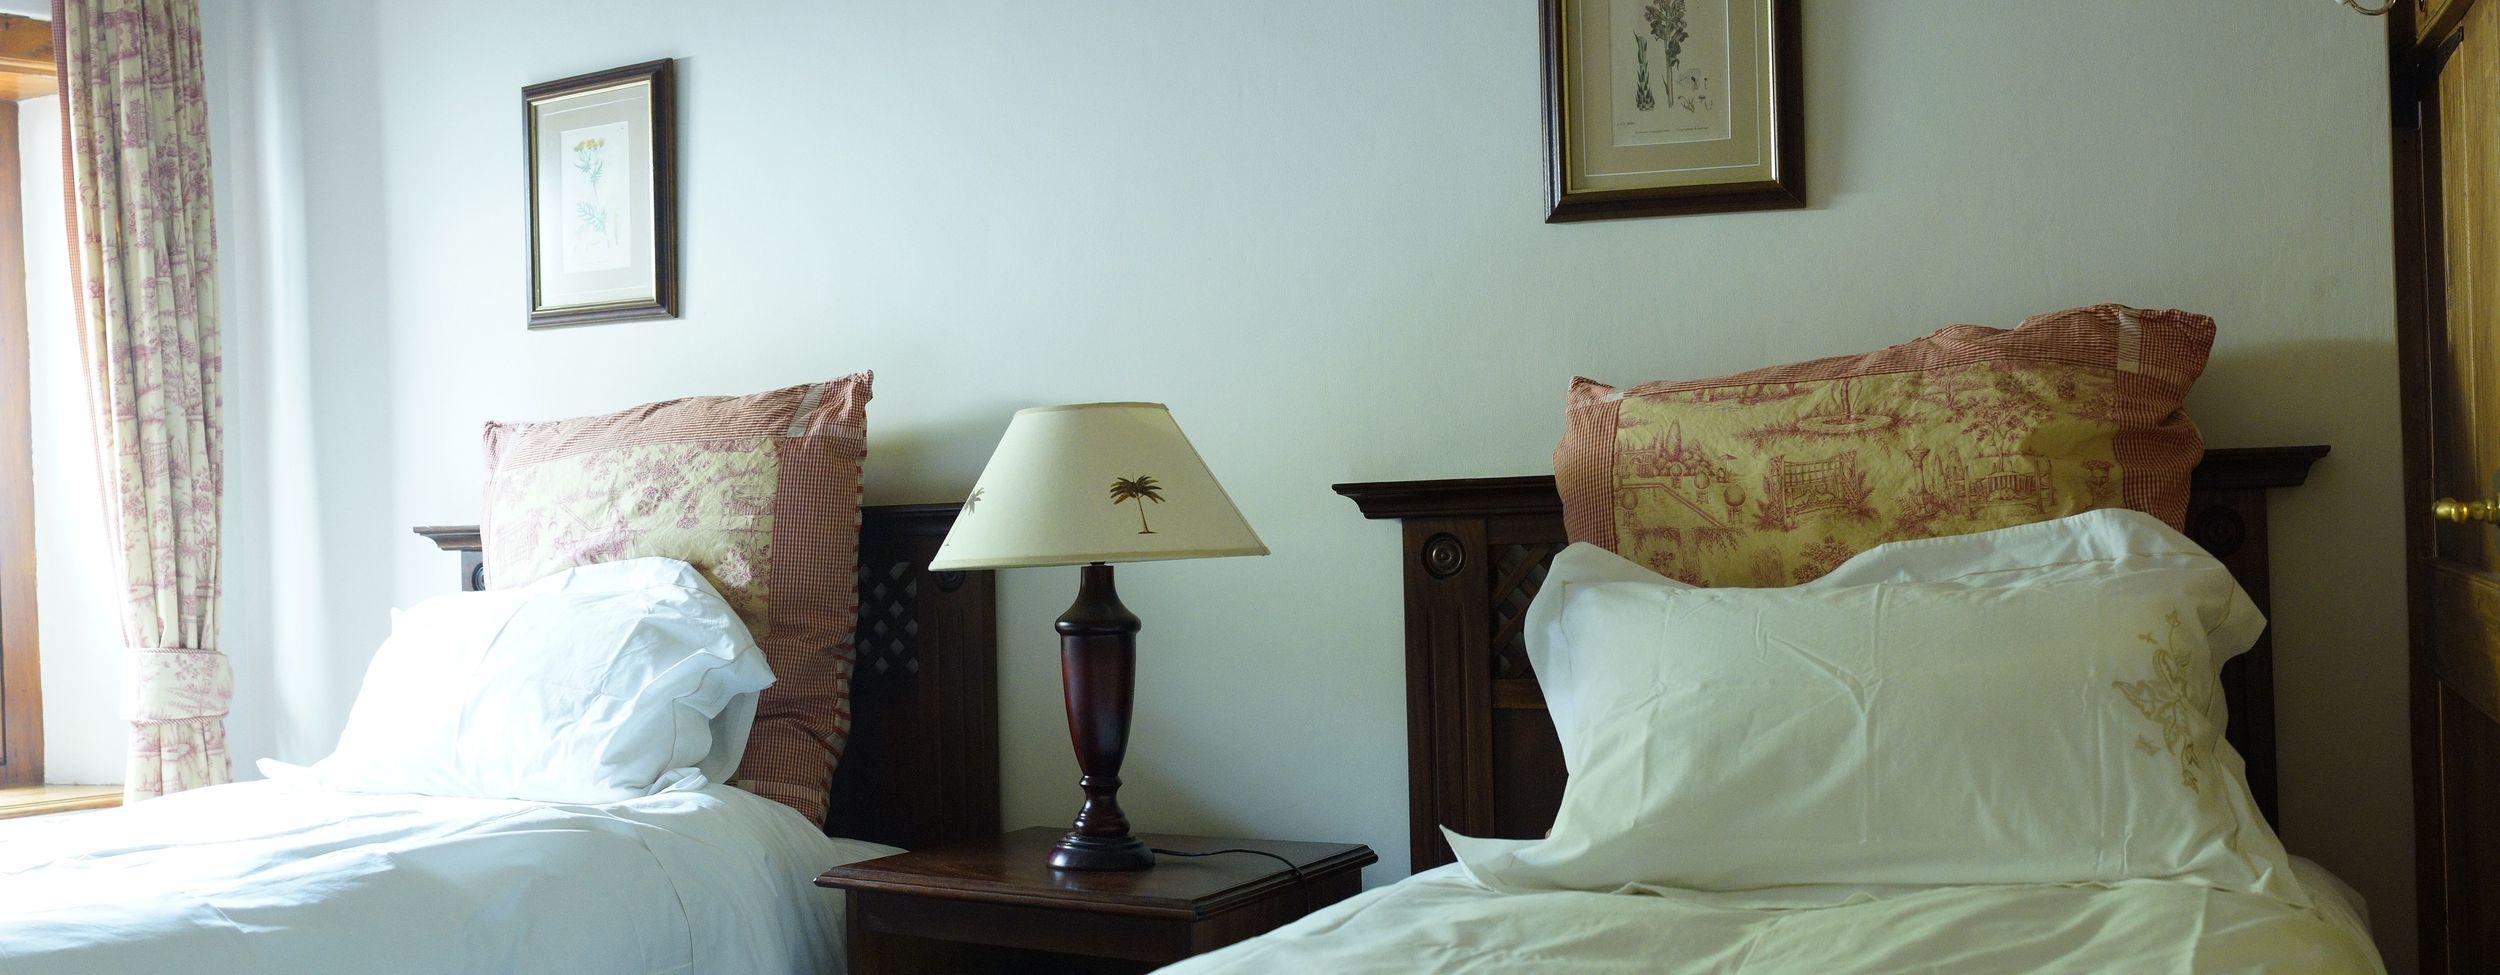 FT bedroom single 1.jpg